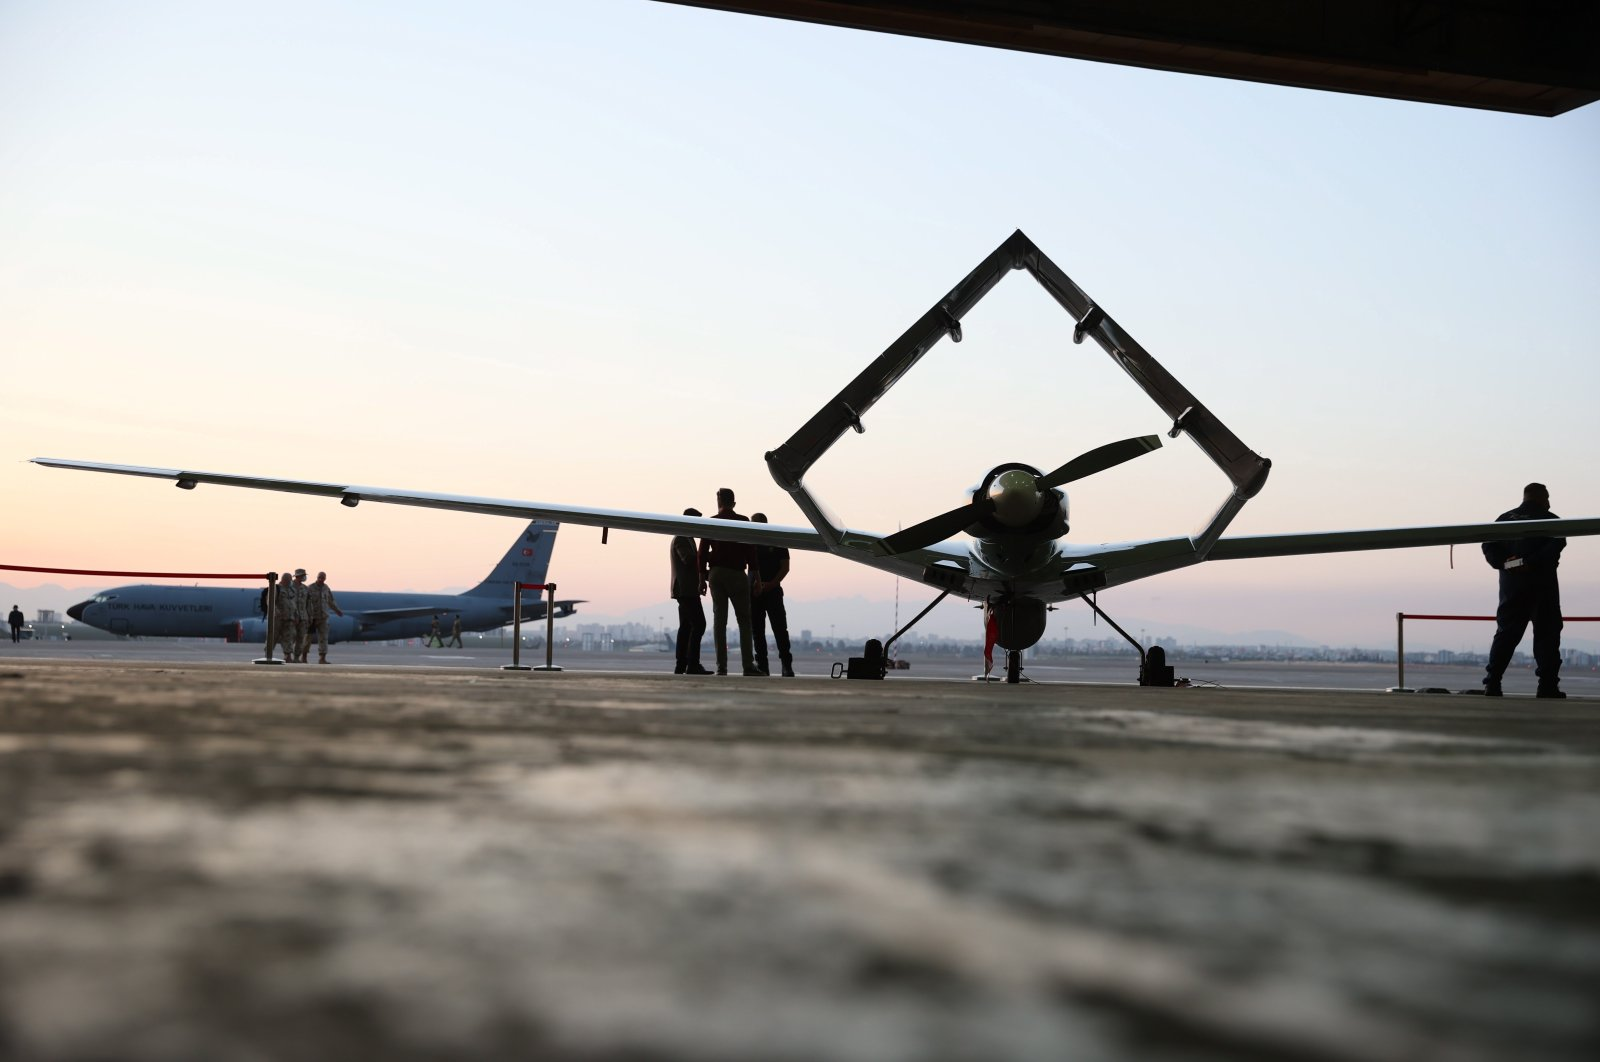 A view of the Bayraktar TB2 combat drones at the İncirlik air base, Adana, southern Turkey, May 25, 2021. (EPA Photo)